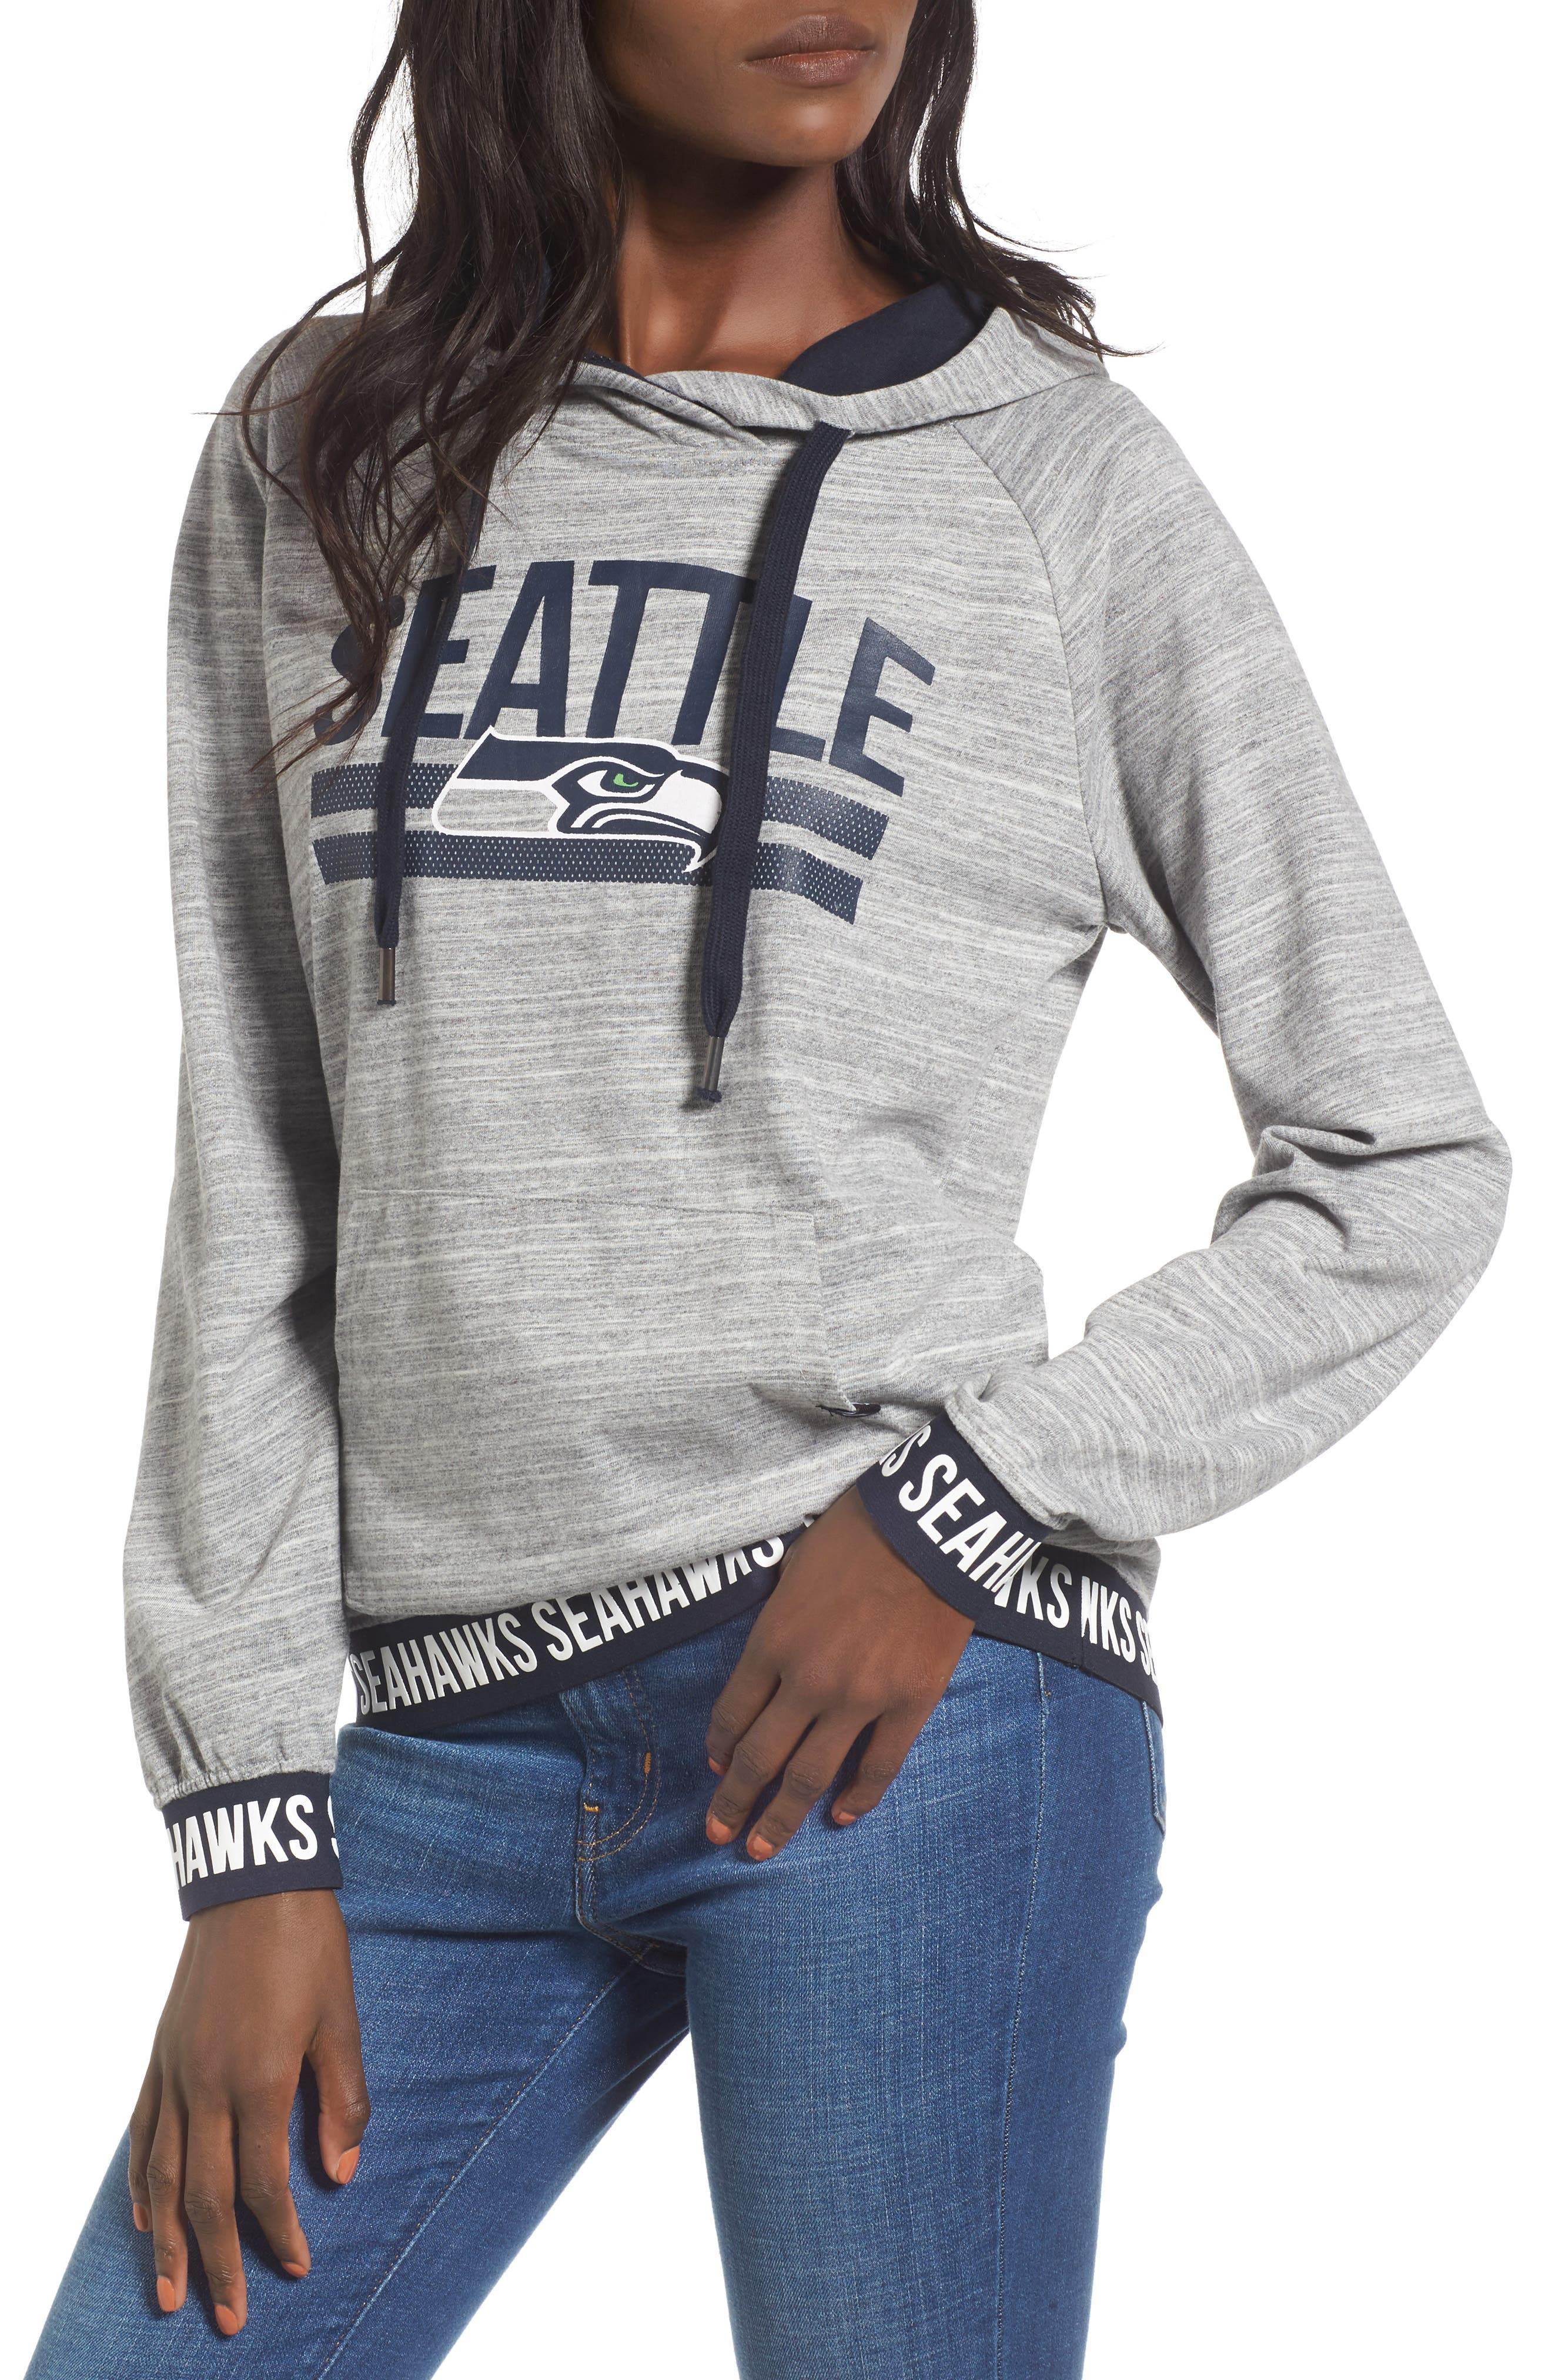 Revolve - Seattle Seahawks Hoodie,                             Main thumbnail 1, color,                             Space Dye Grey